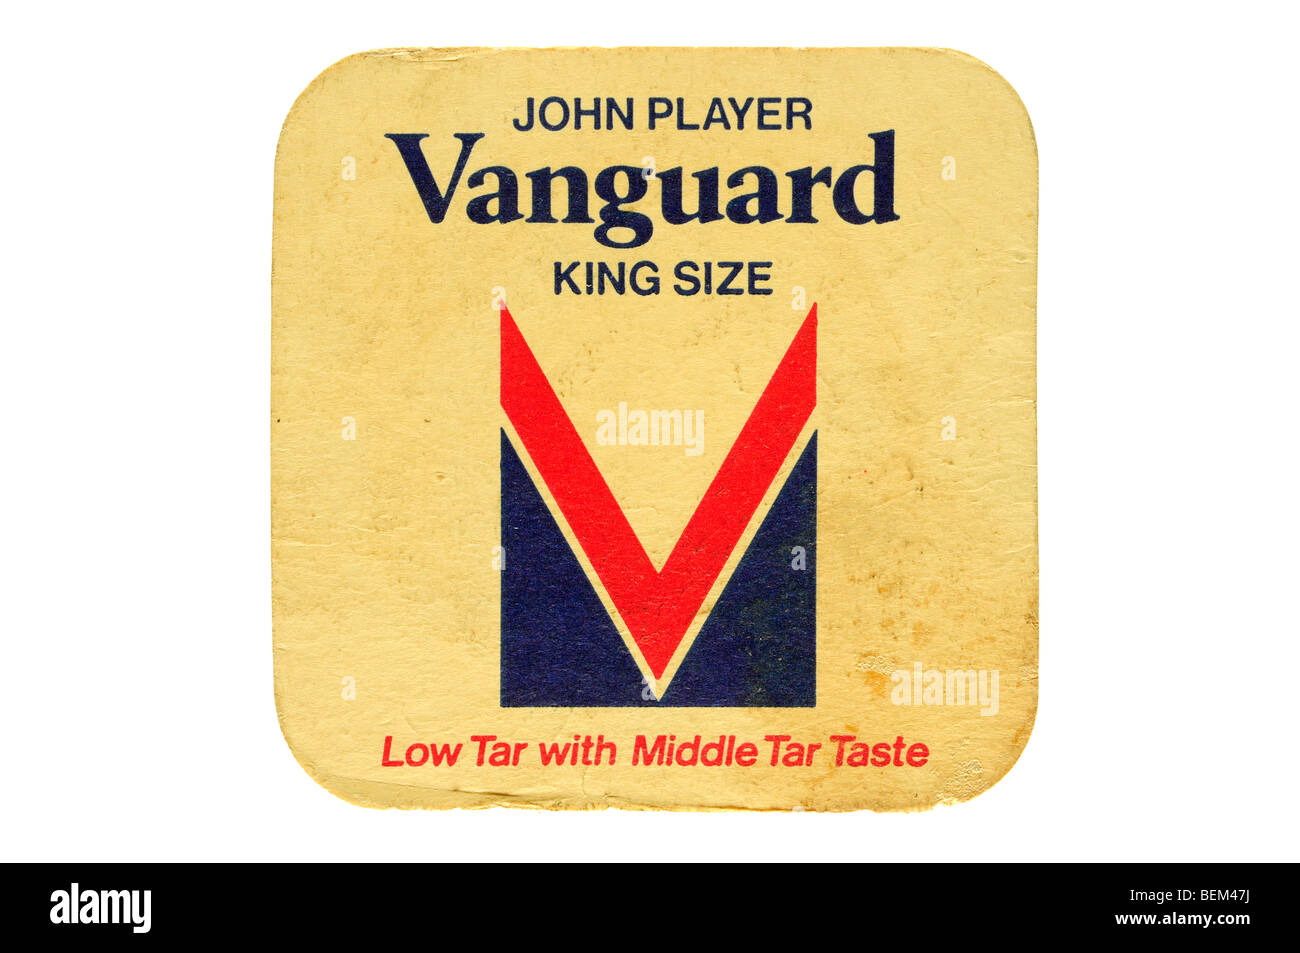 John player vanguard king size low tar with middle tar taste stock john player vanguard king size low tar with middle tar taste biocorpaavc